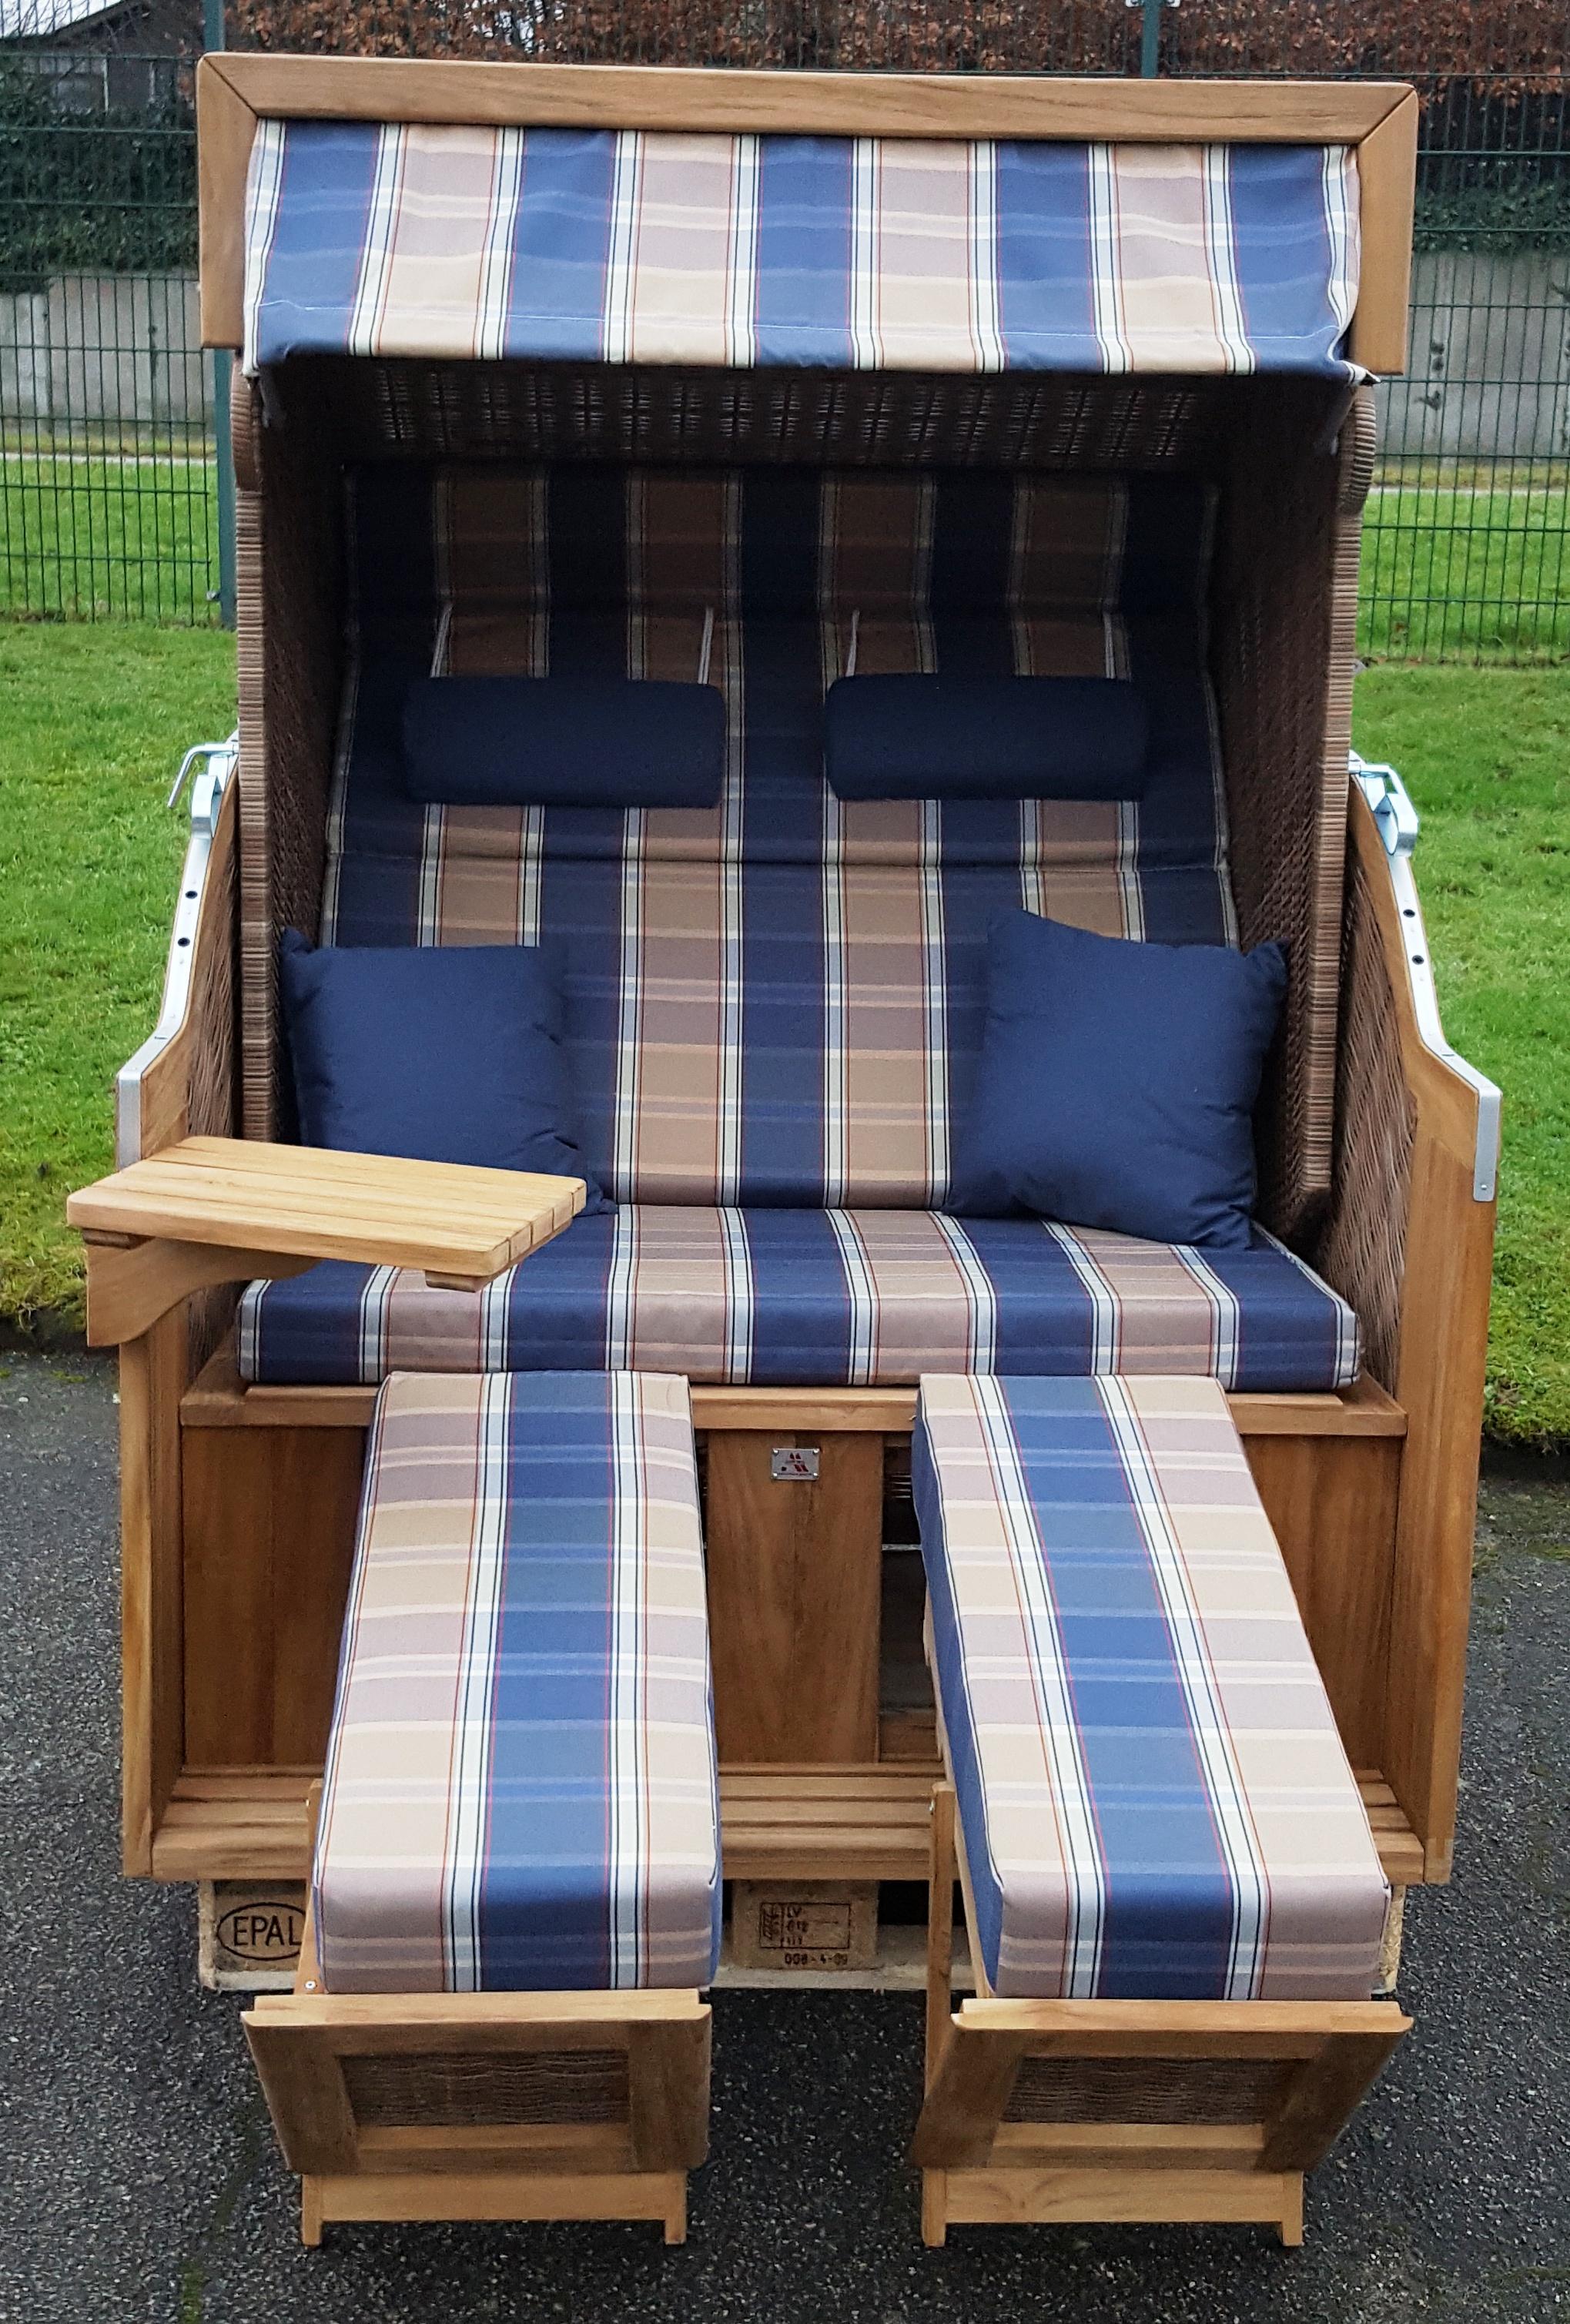 devries teak strandkorb pure comfort xl griseum 428 montiert. Black Bedroom Furniture Sets. Home Design Ideas